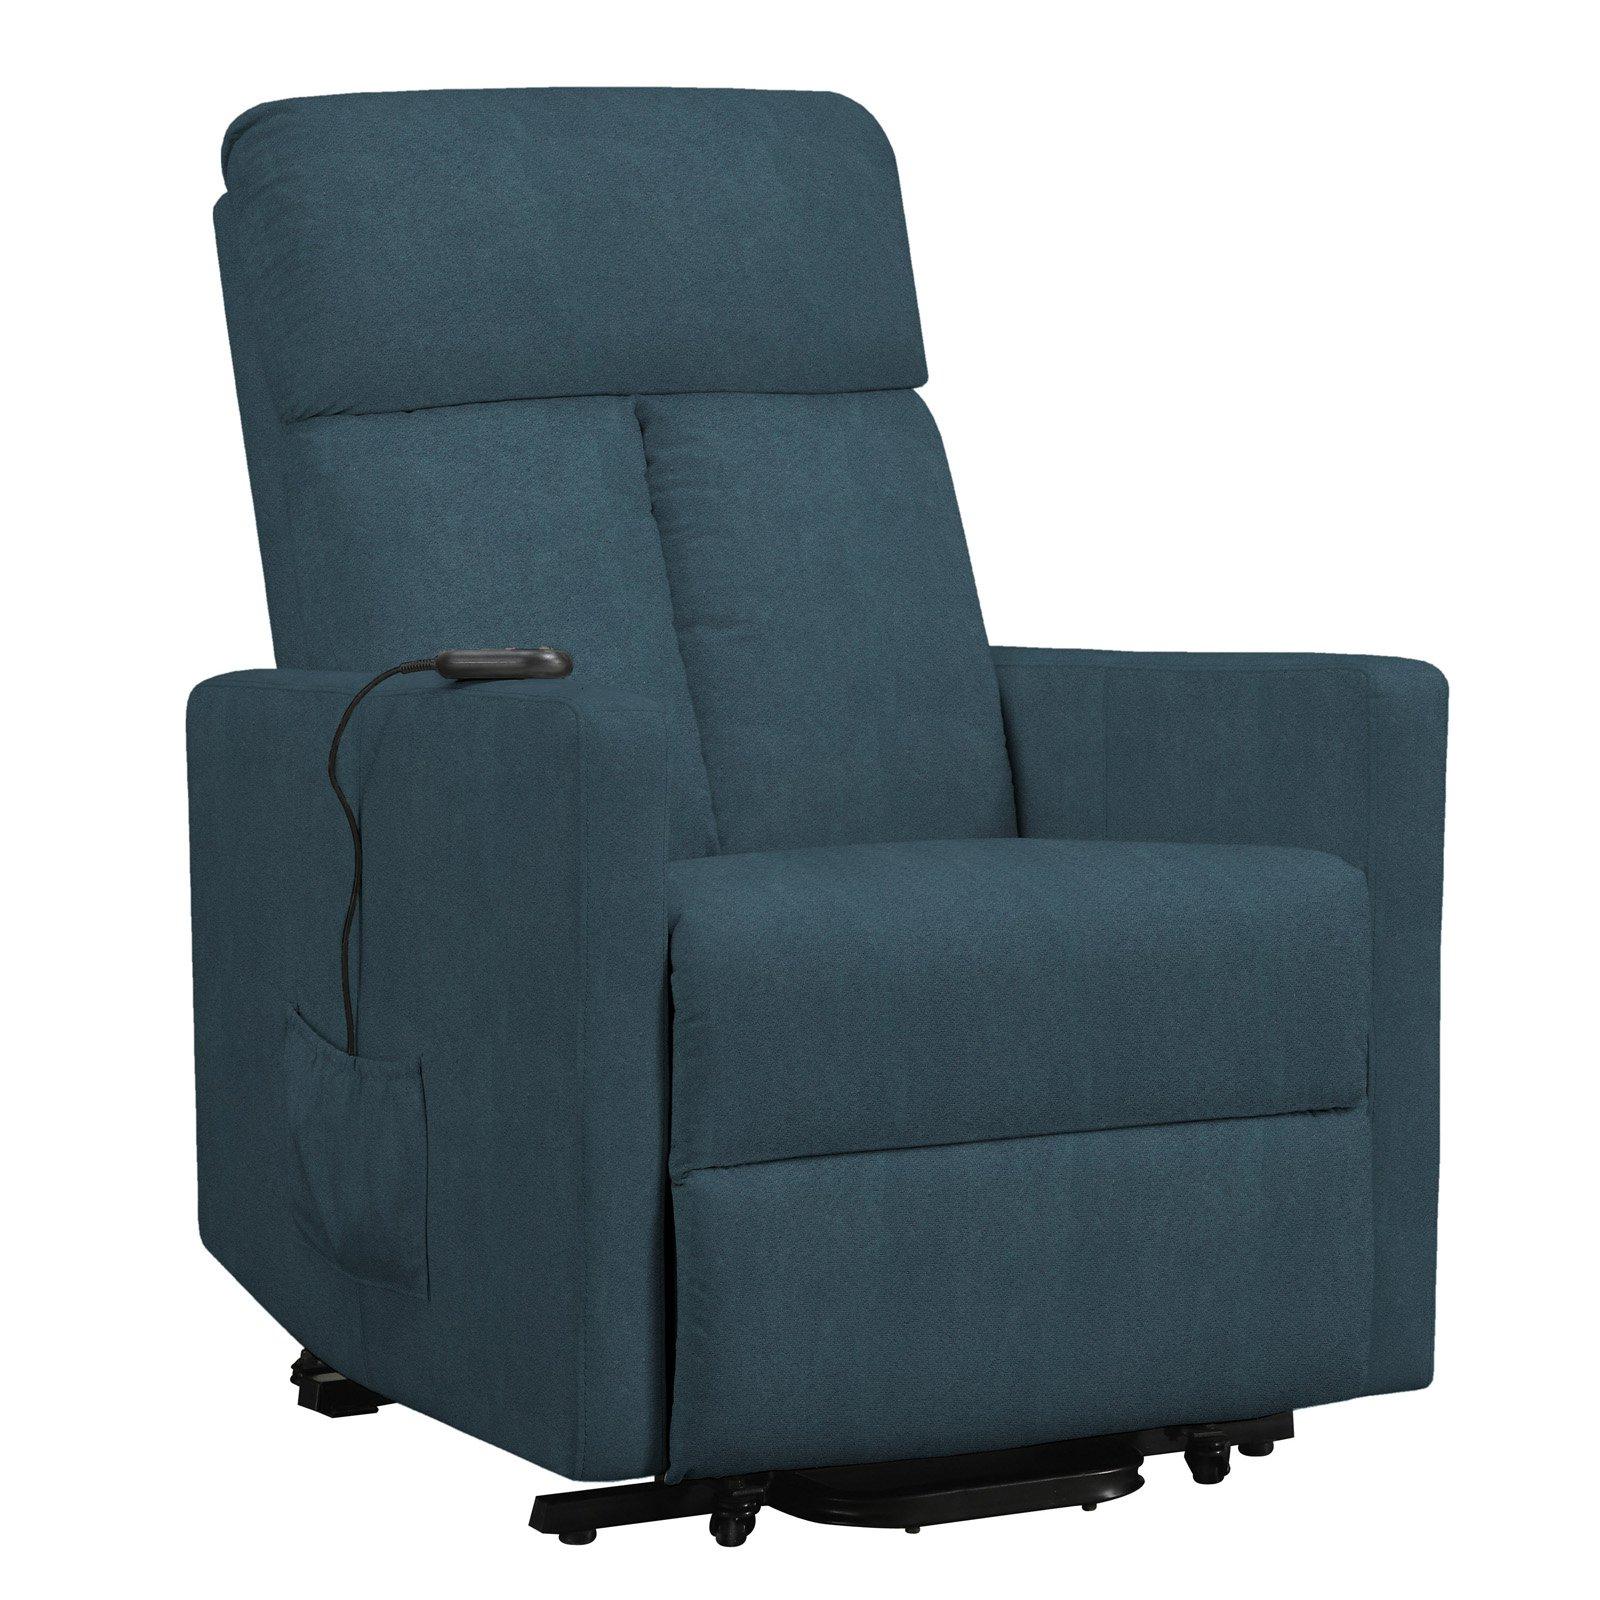 Pleasant Prolounger Microfiber Power Lift Chair Recliner Blue Dailytribune Chair Design For Home Dailytribuneorg